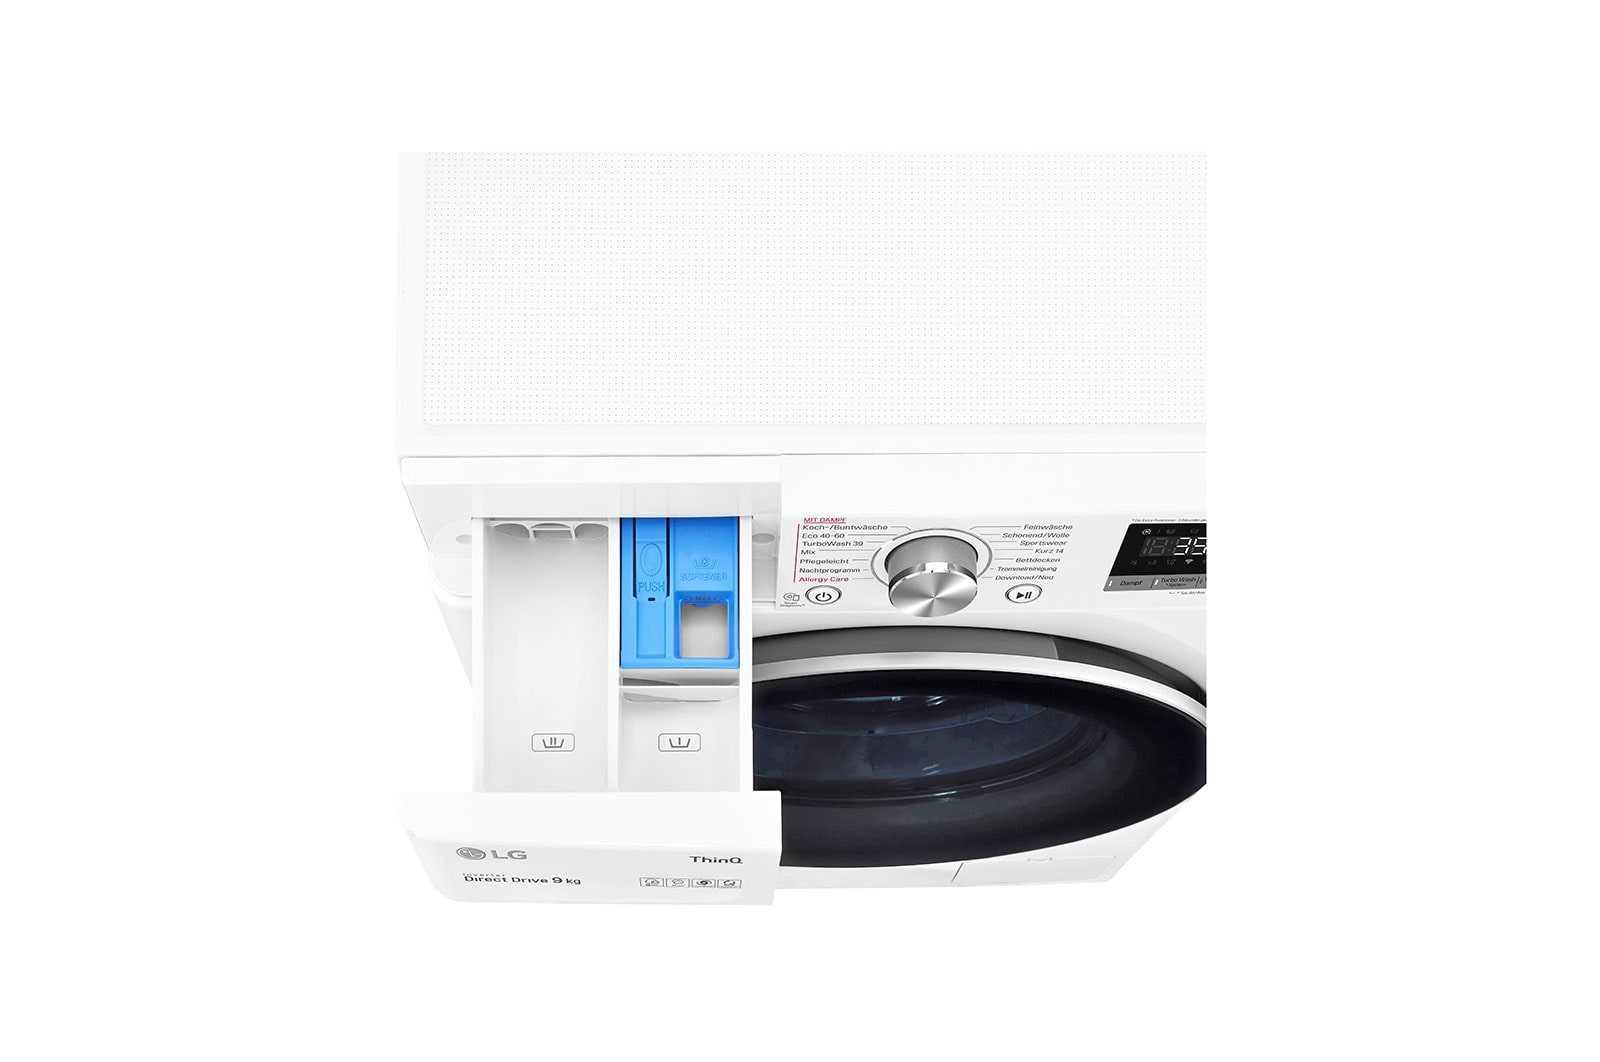 LG F4WV709P1E   Waschmaschine   9 kg   AI DD™   Steam   TurboWash™ 360°